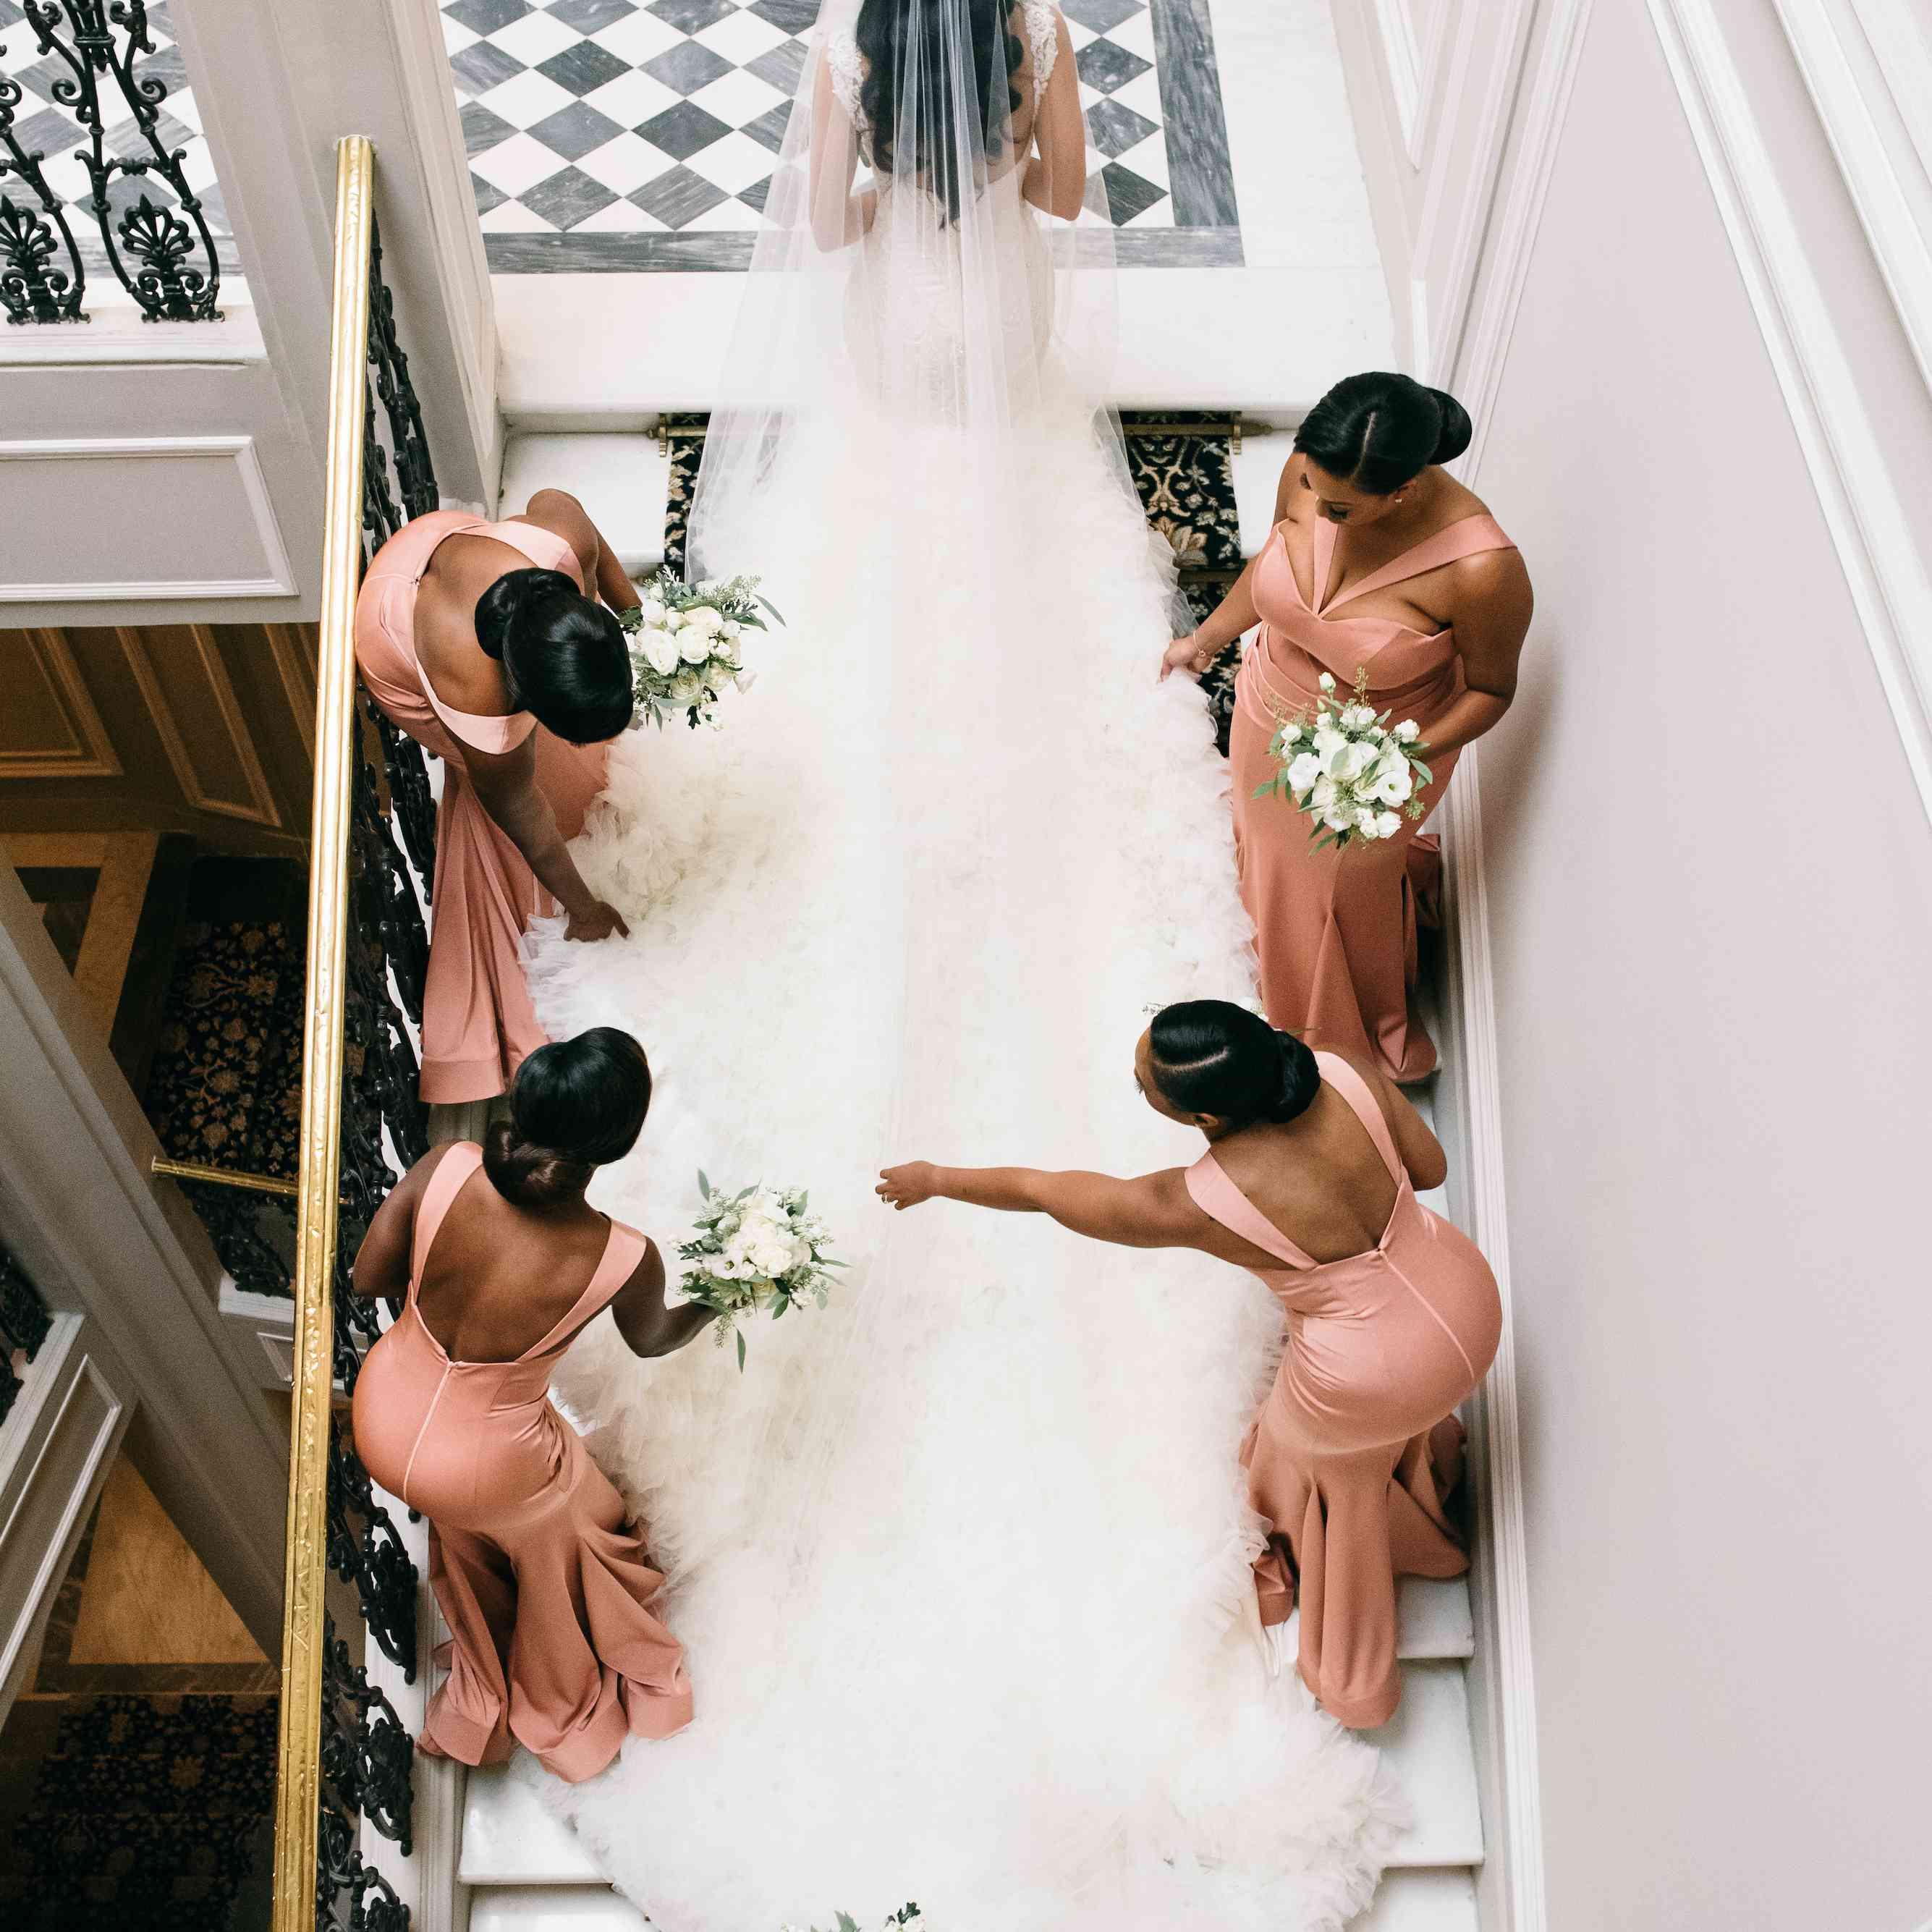 bridal party fixing wedding dress